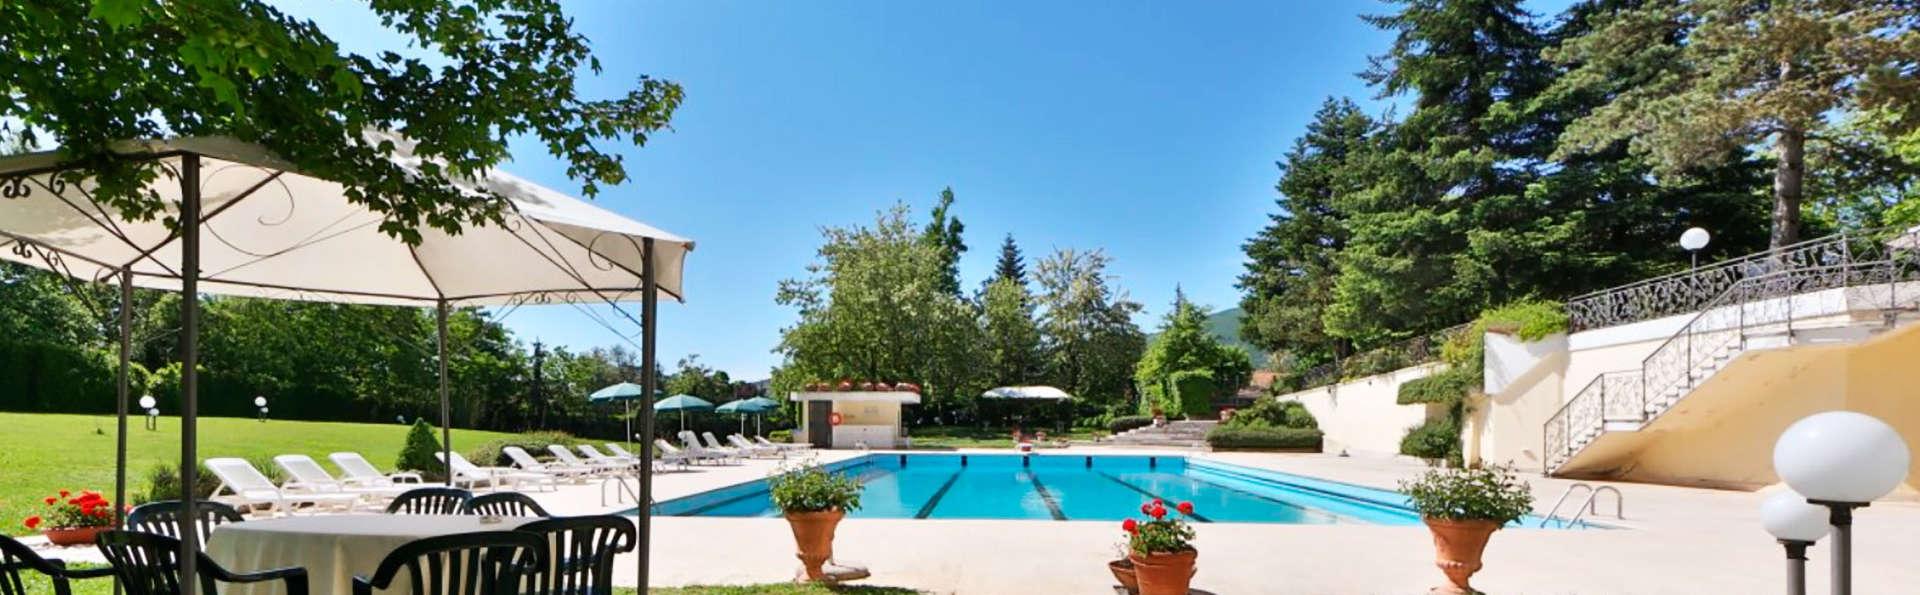 Hotel Fiuggi Terme Resort & SPA - edit_garden.jpg